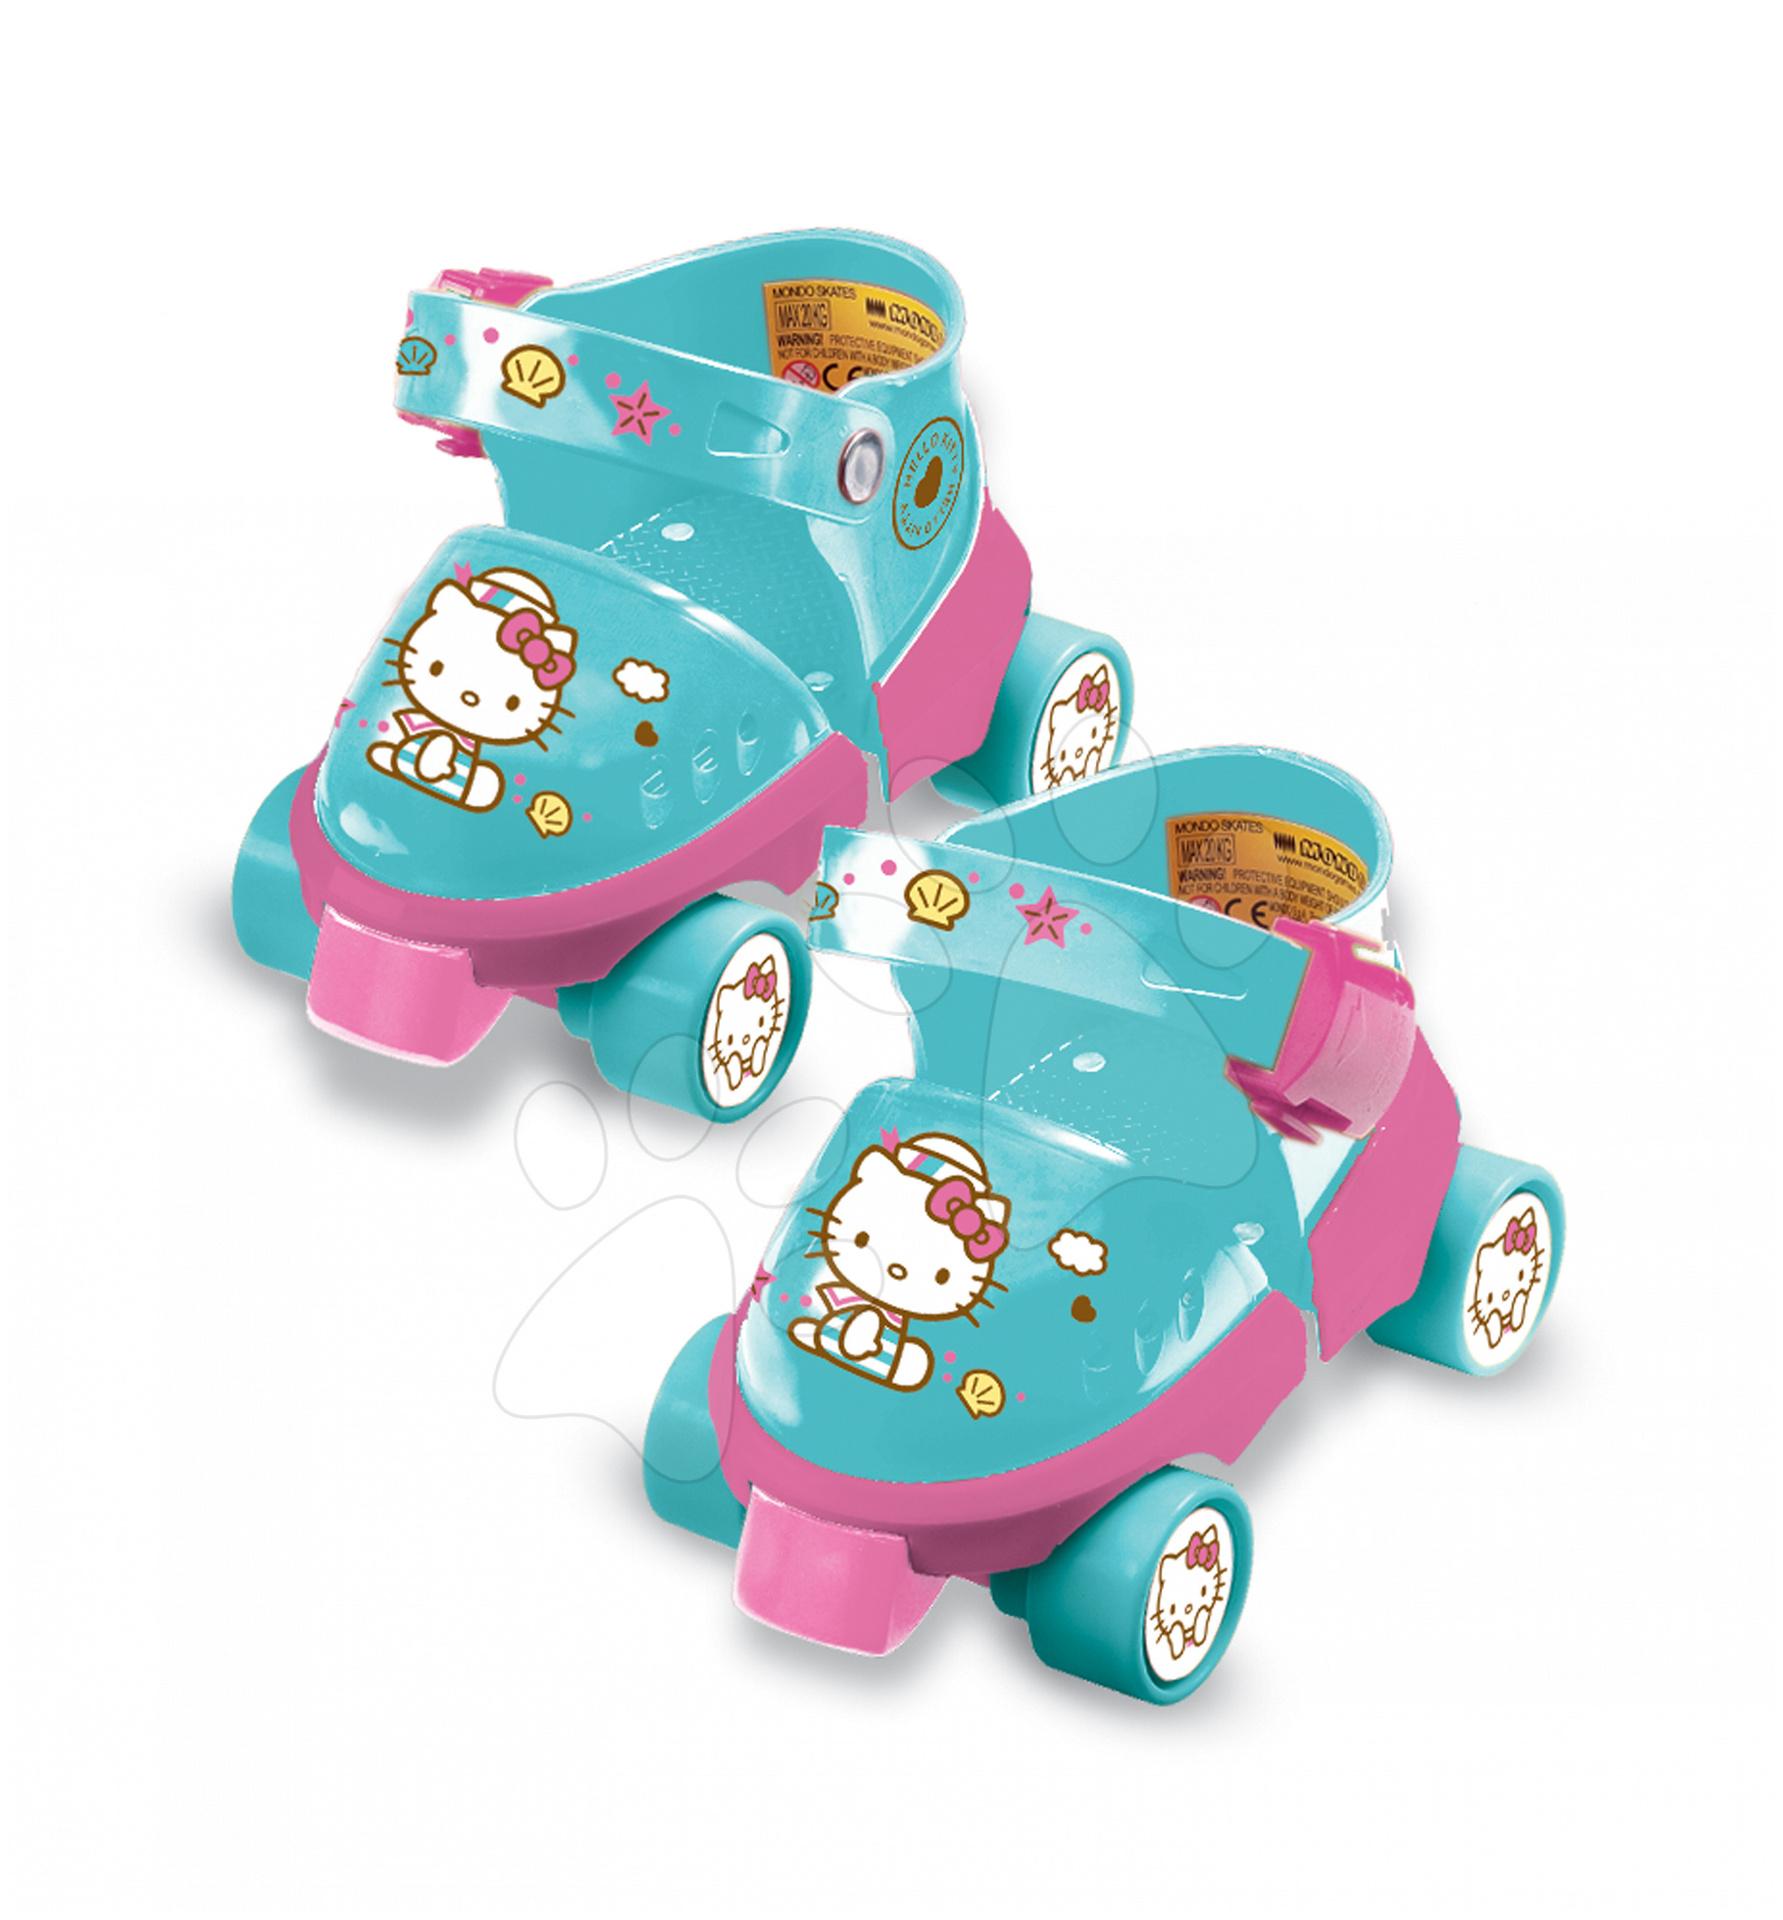 Kolečkové brusle Hello Kitty Mondo s chrániči velikost 22-29